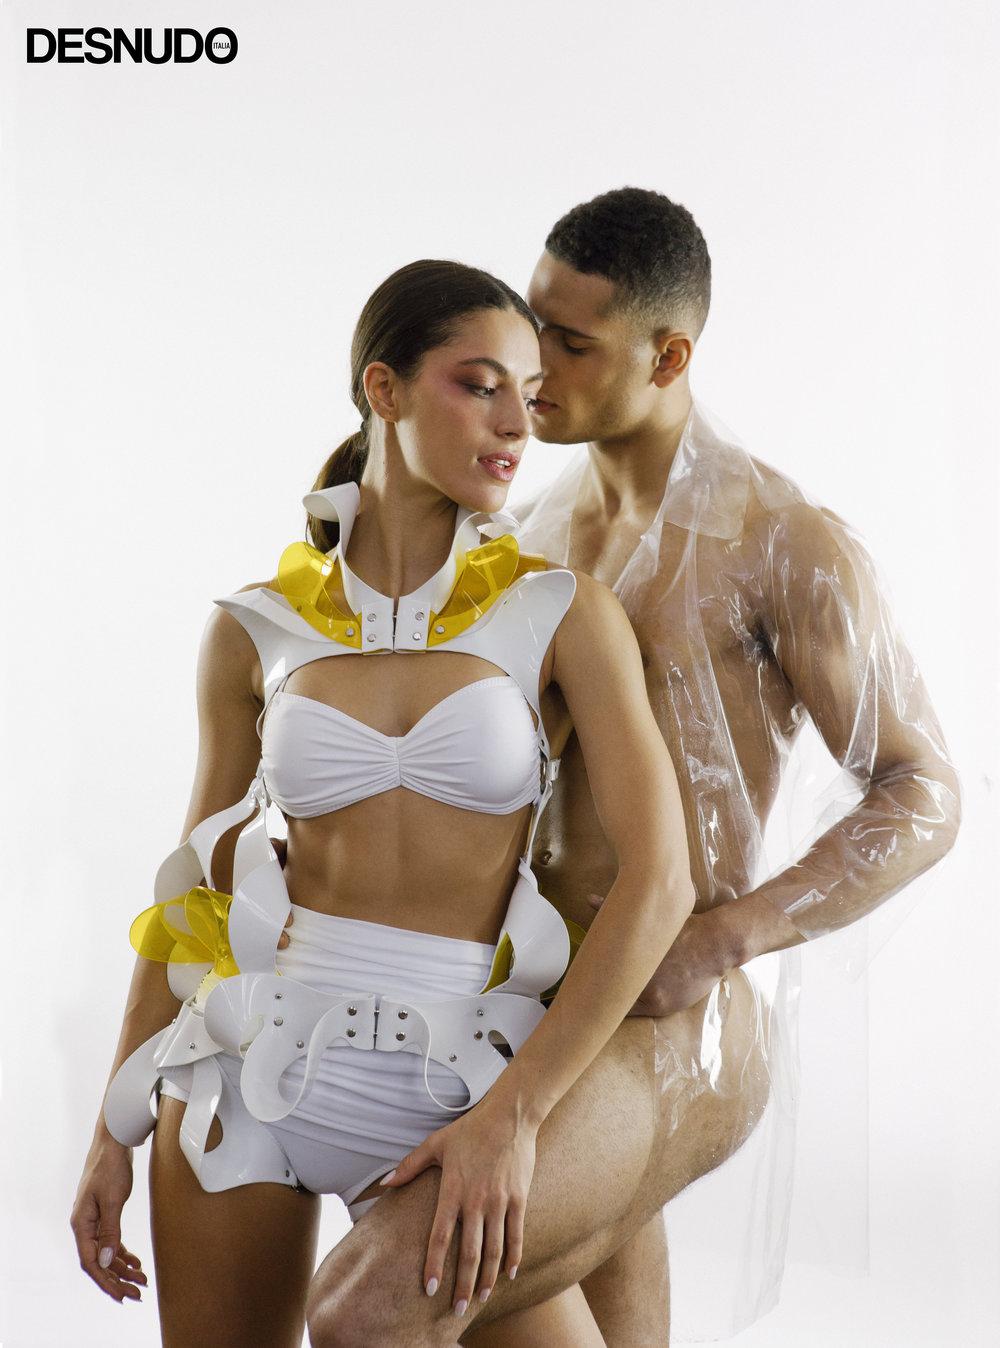 Desirée wears beachwear  NORMA KAMALI , harness  LEATHER ARTEFACT , shoes  MANOLO BLAHNIK , Danny wears shirt  NORMA KAMALI